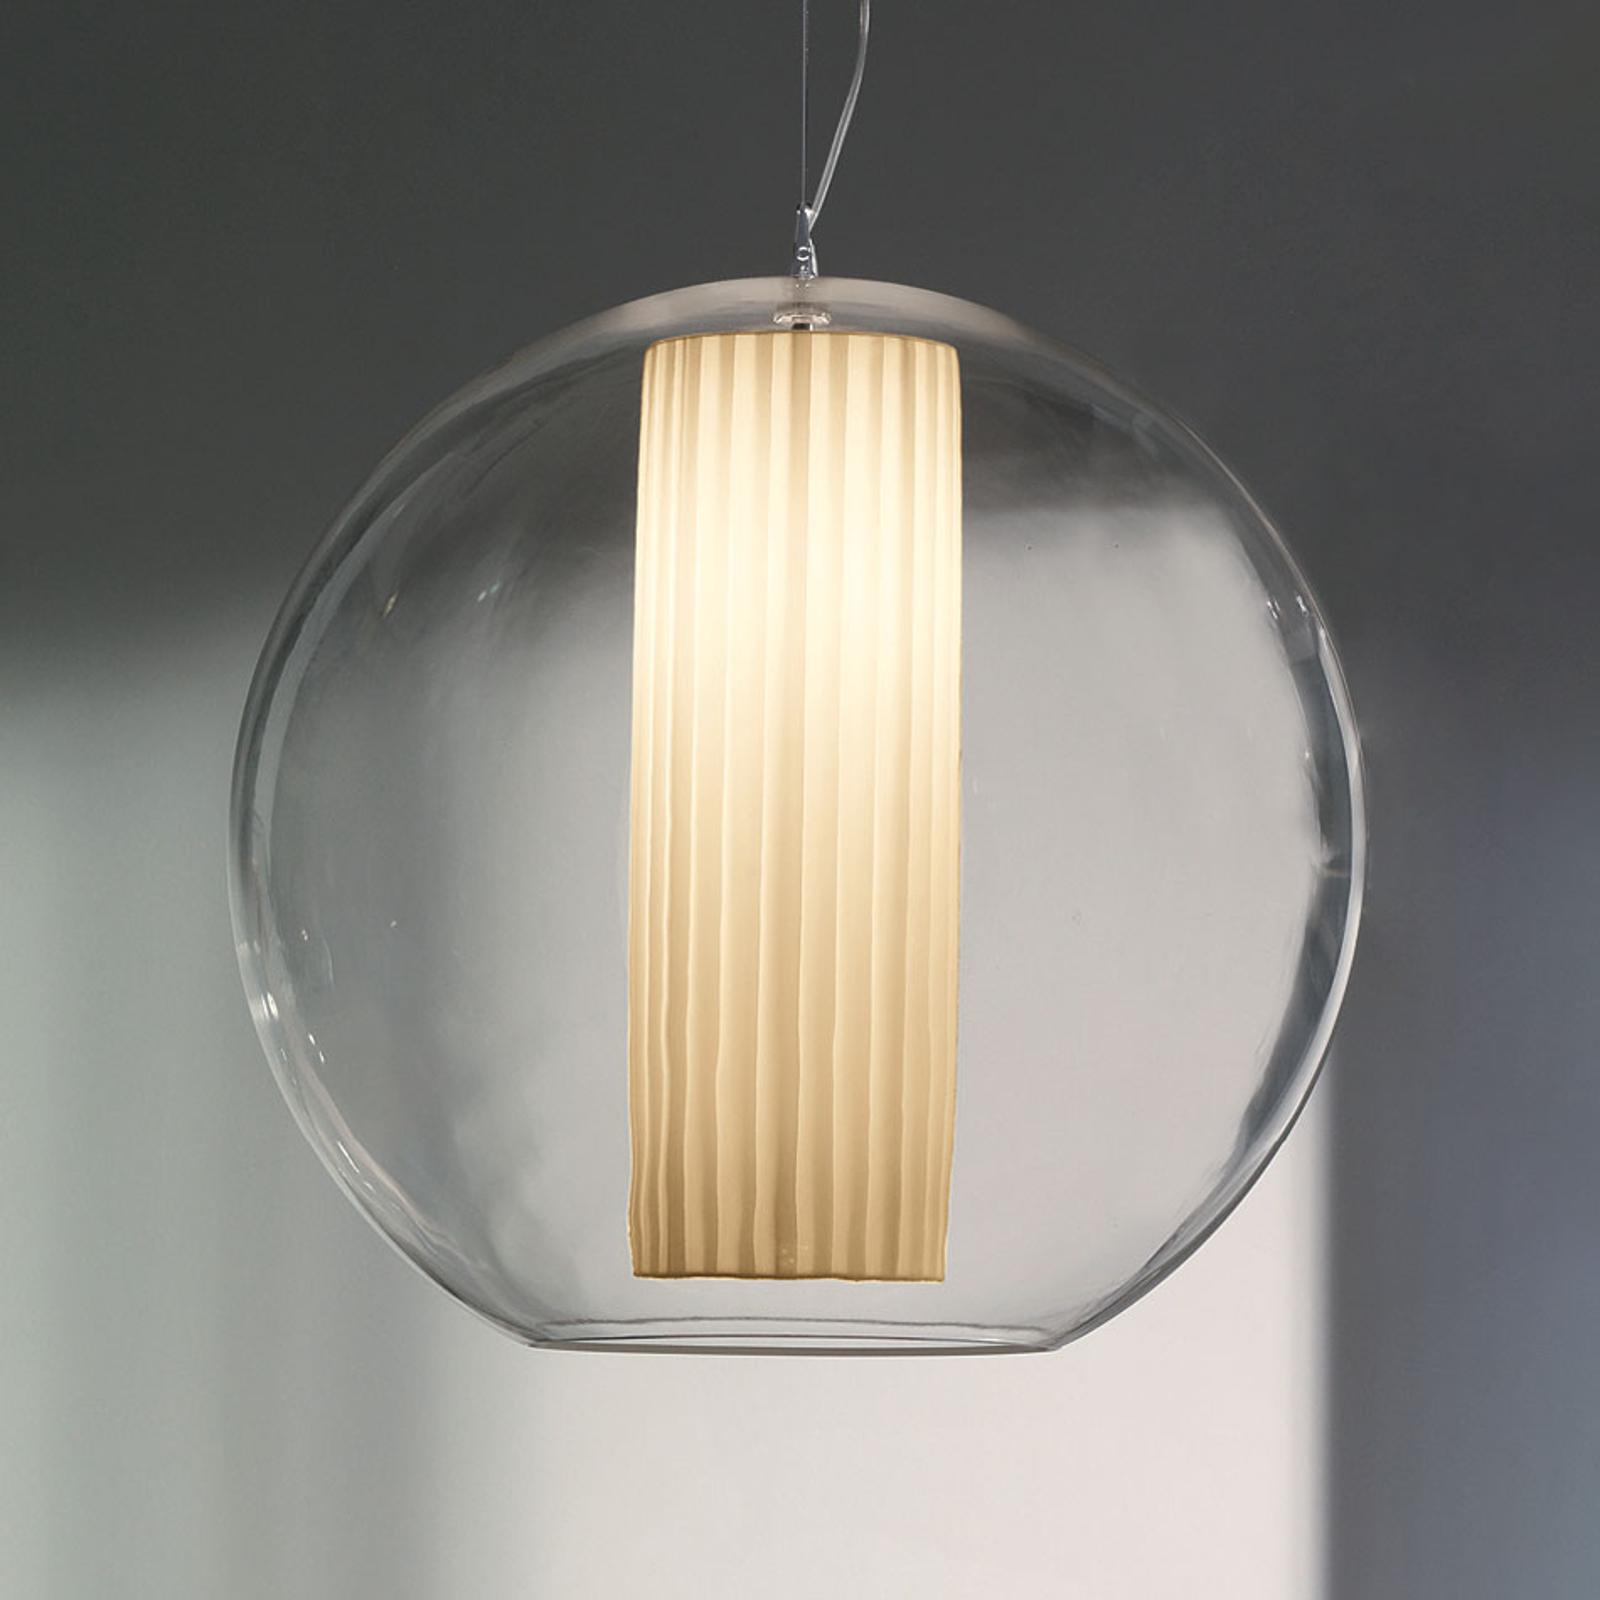 Modo Luce Bolla hanglamp stof wit Ø 60cm